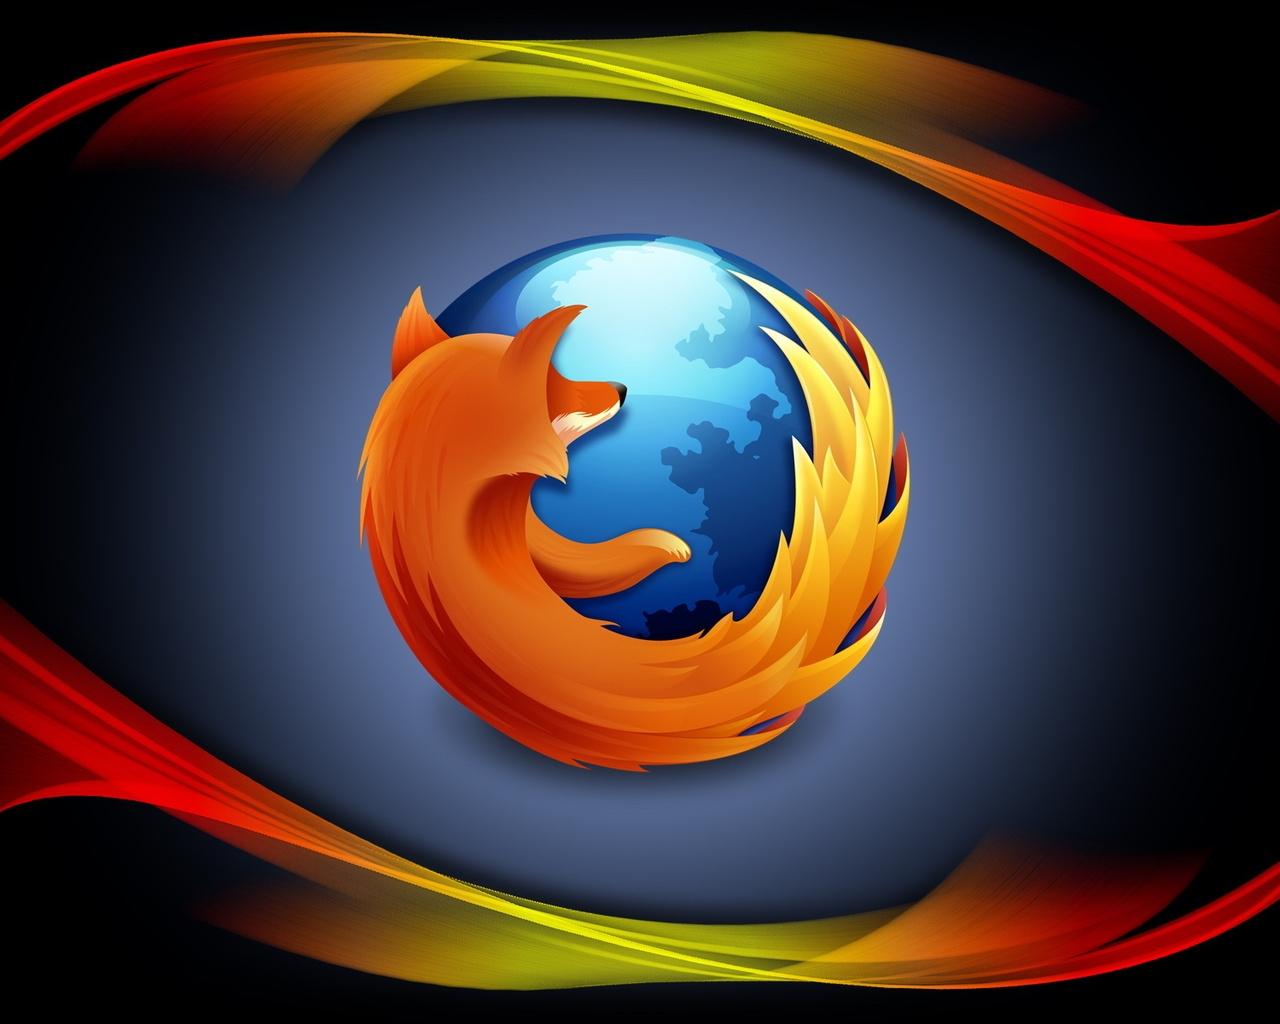 Mozilla Firefox Desktop Wallpapers, Firefox Backgrounds ...